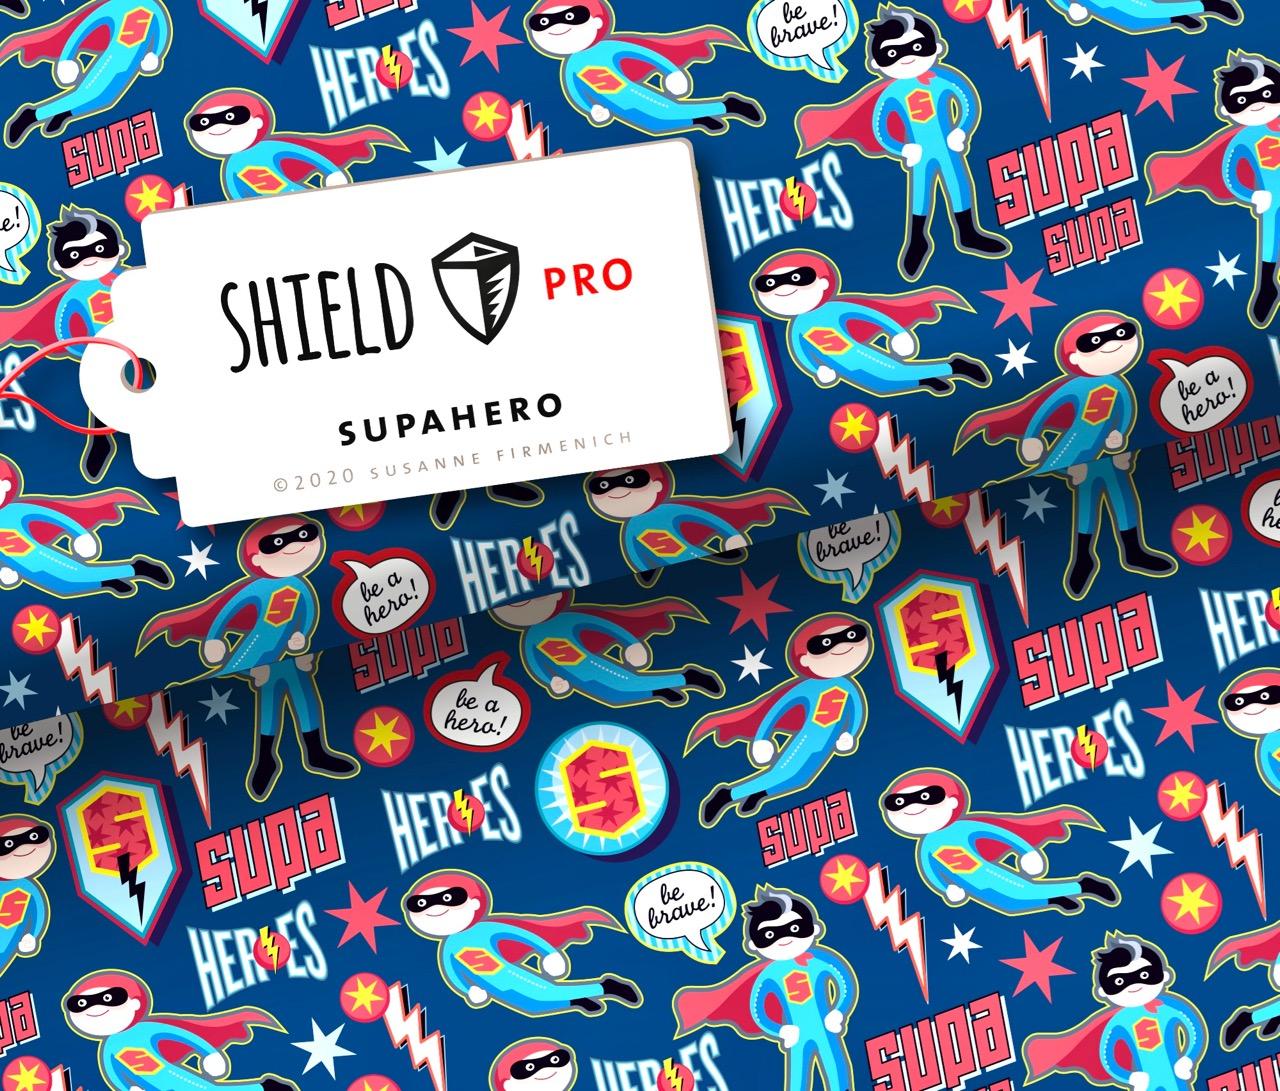 Shield PRO KIDS - Supahero von Hamburger Liebe & Albstoffe - antimikrobiell